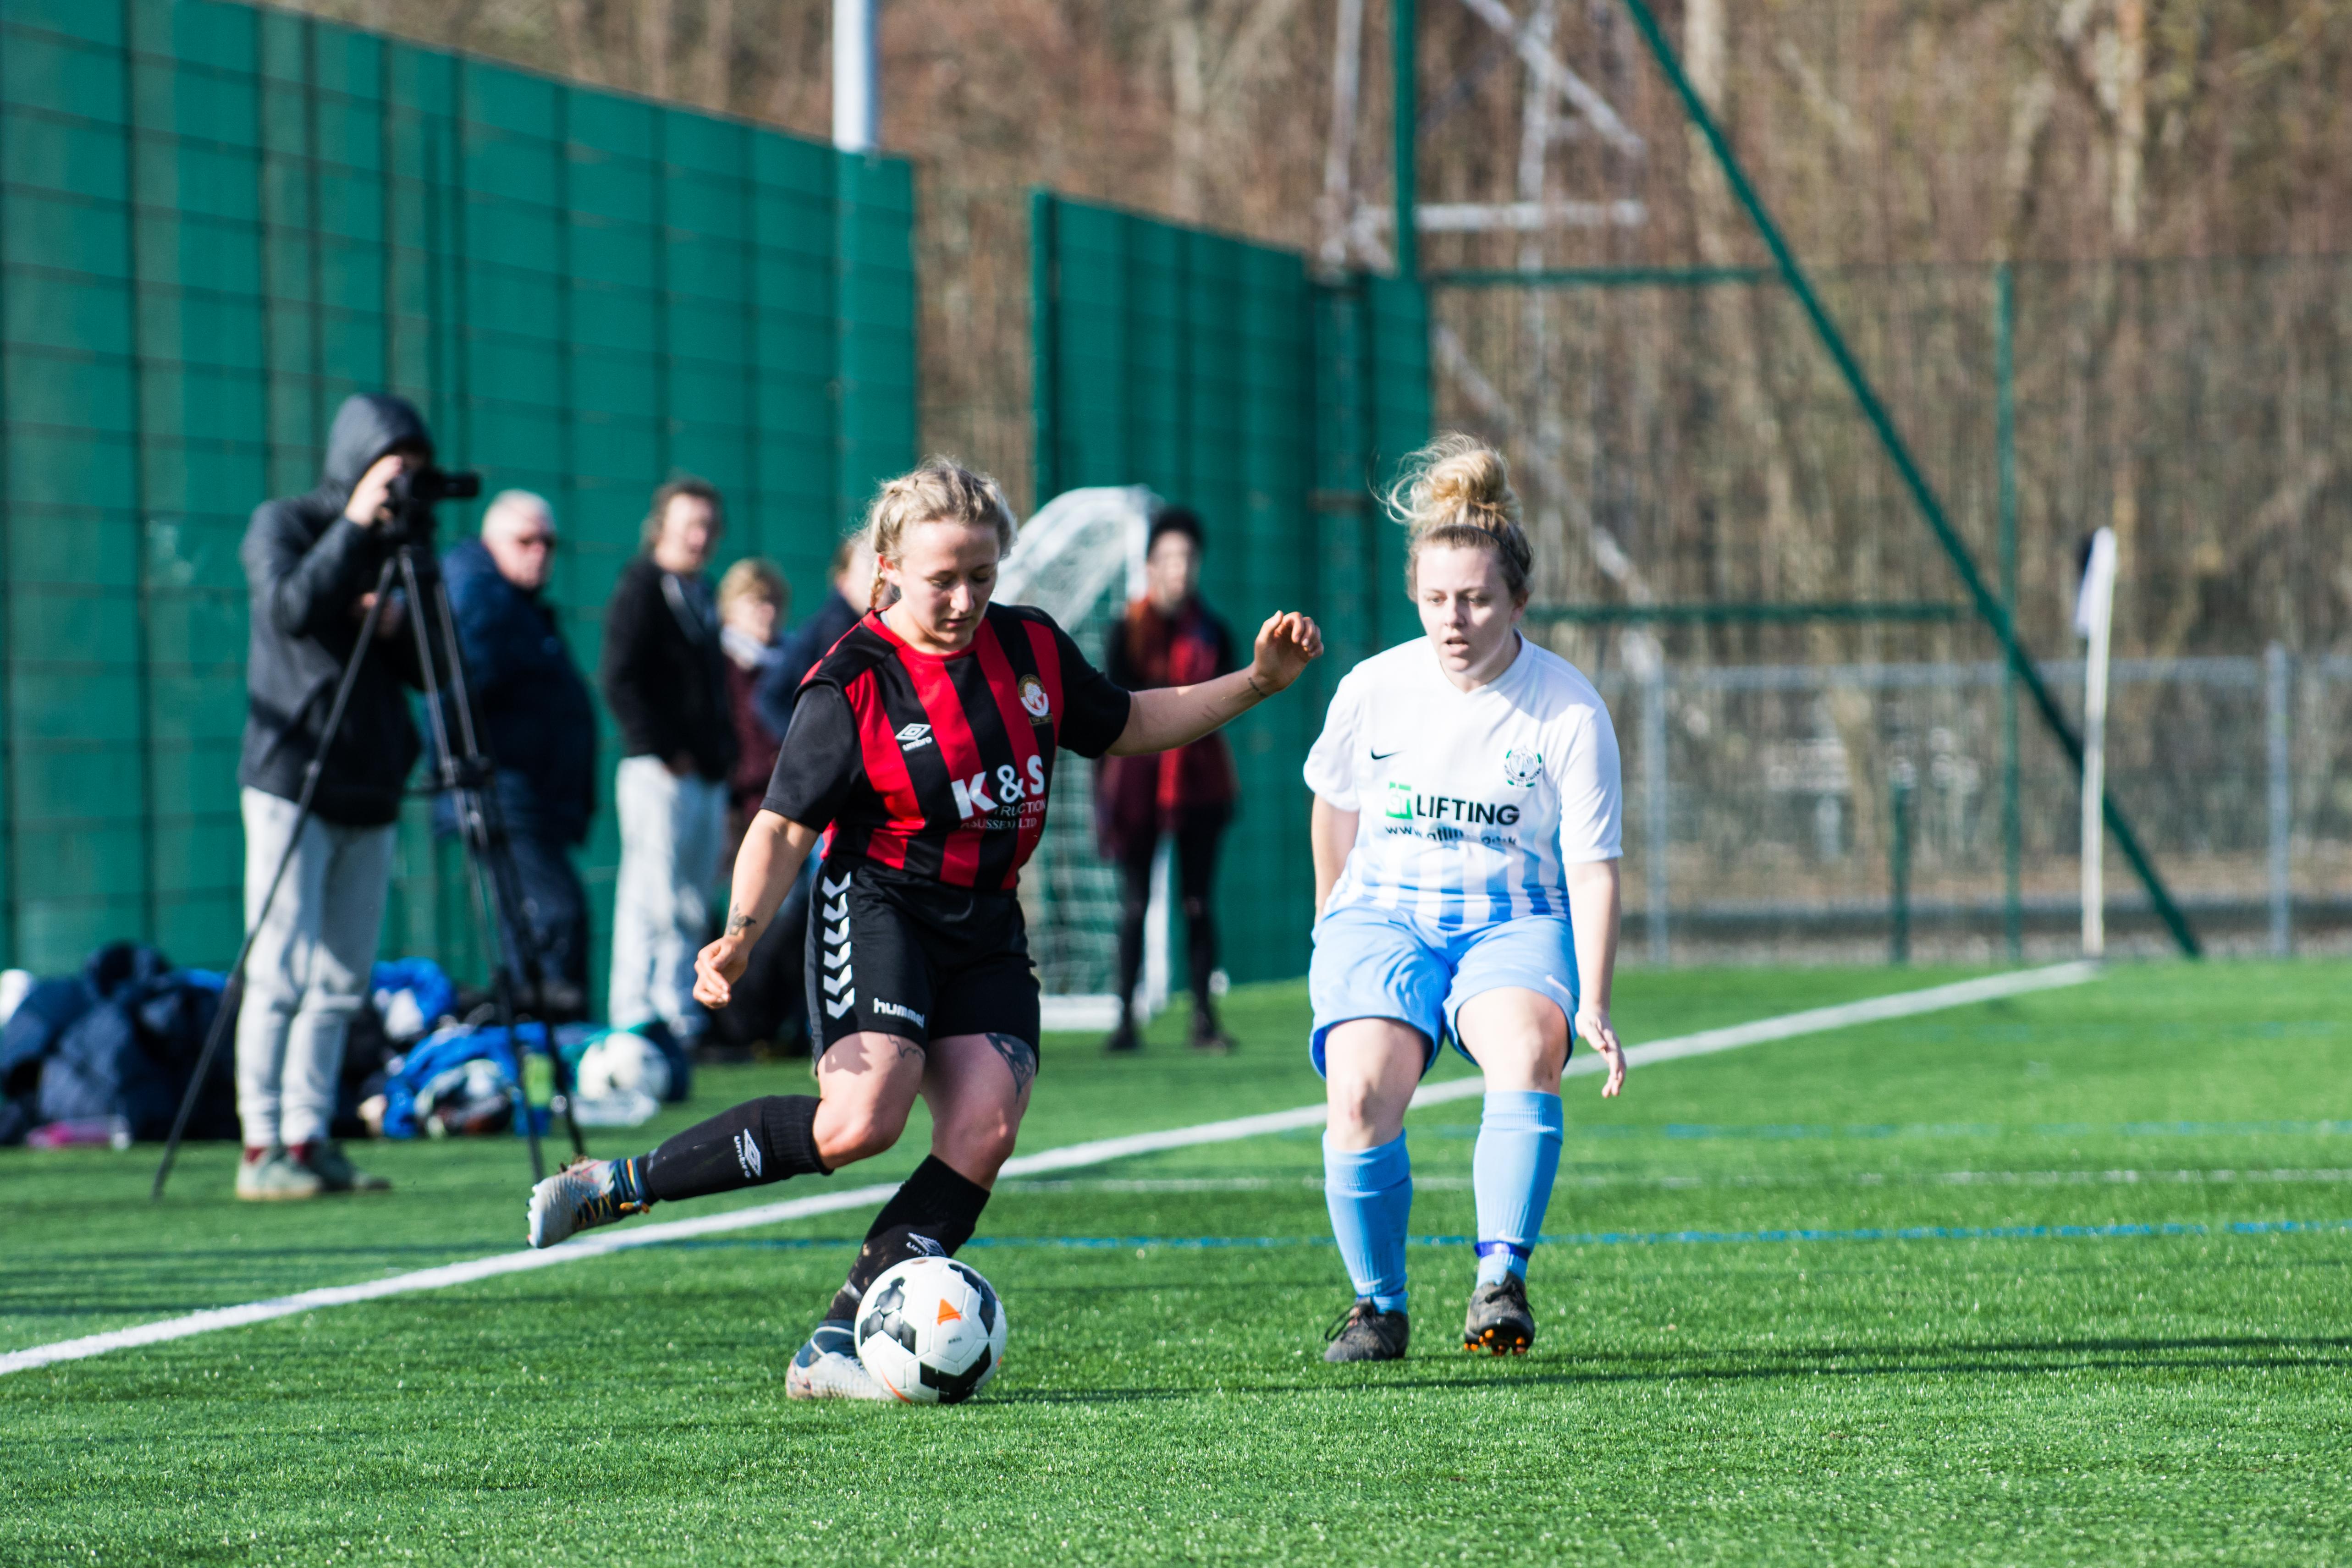 DAVID_JEFFERY Saltdean Utd Ladies FC vs Worthing Utd Ladies FC 11.03.18 19